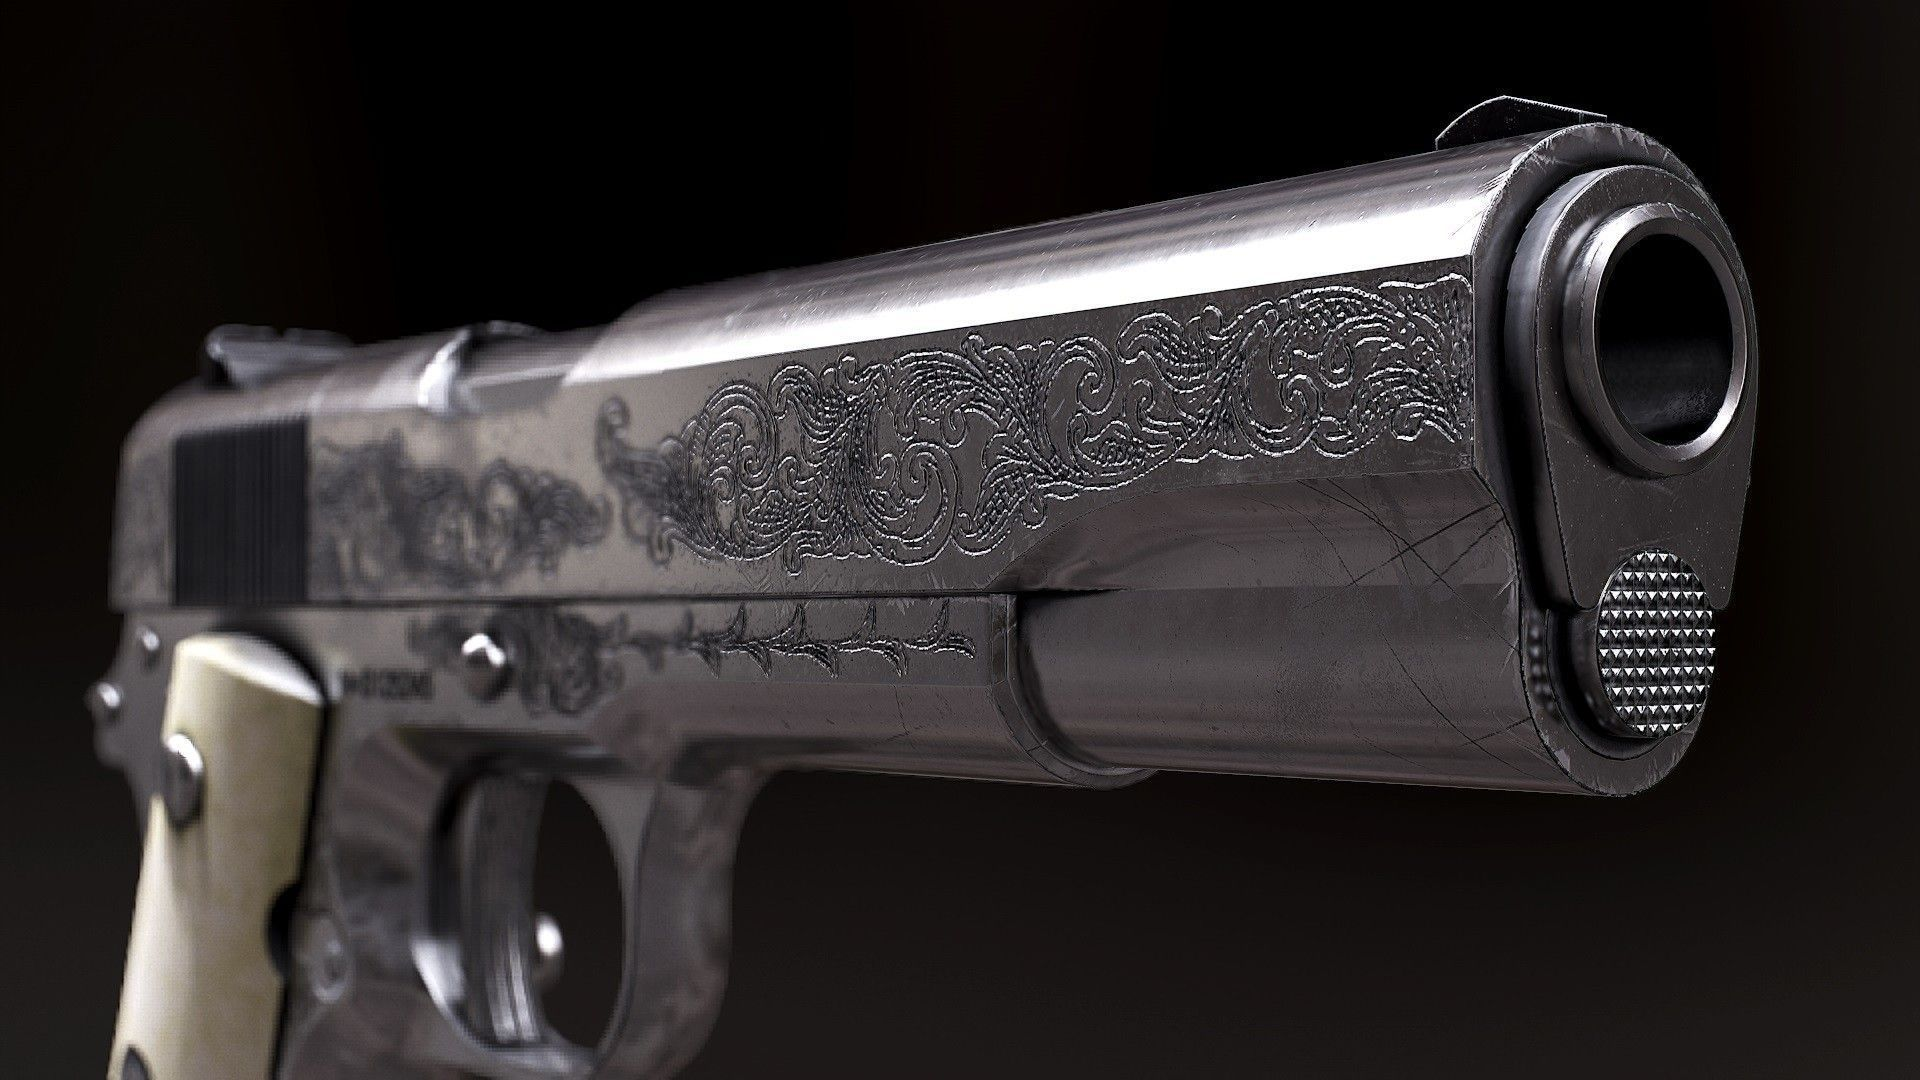 Wallpaper Supernatural 3d 3d Model Colt 1911 Black And Chrome Model And Textures